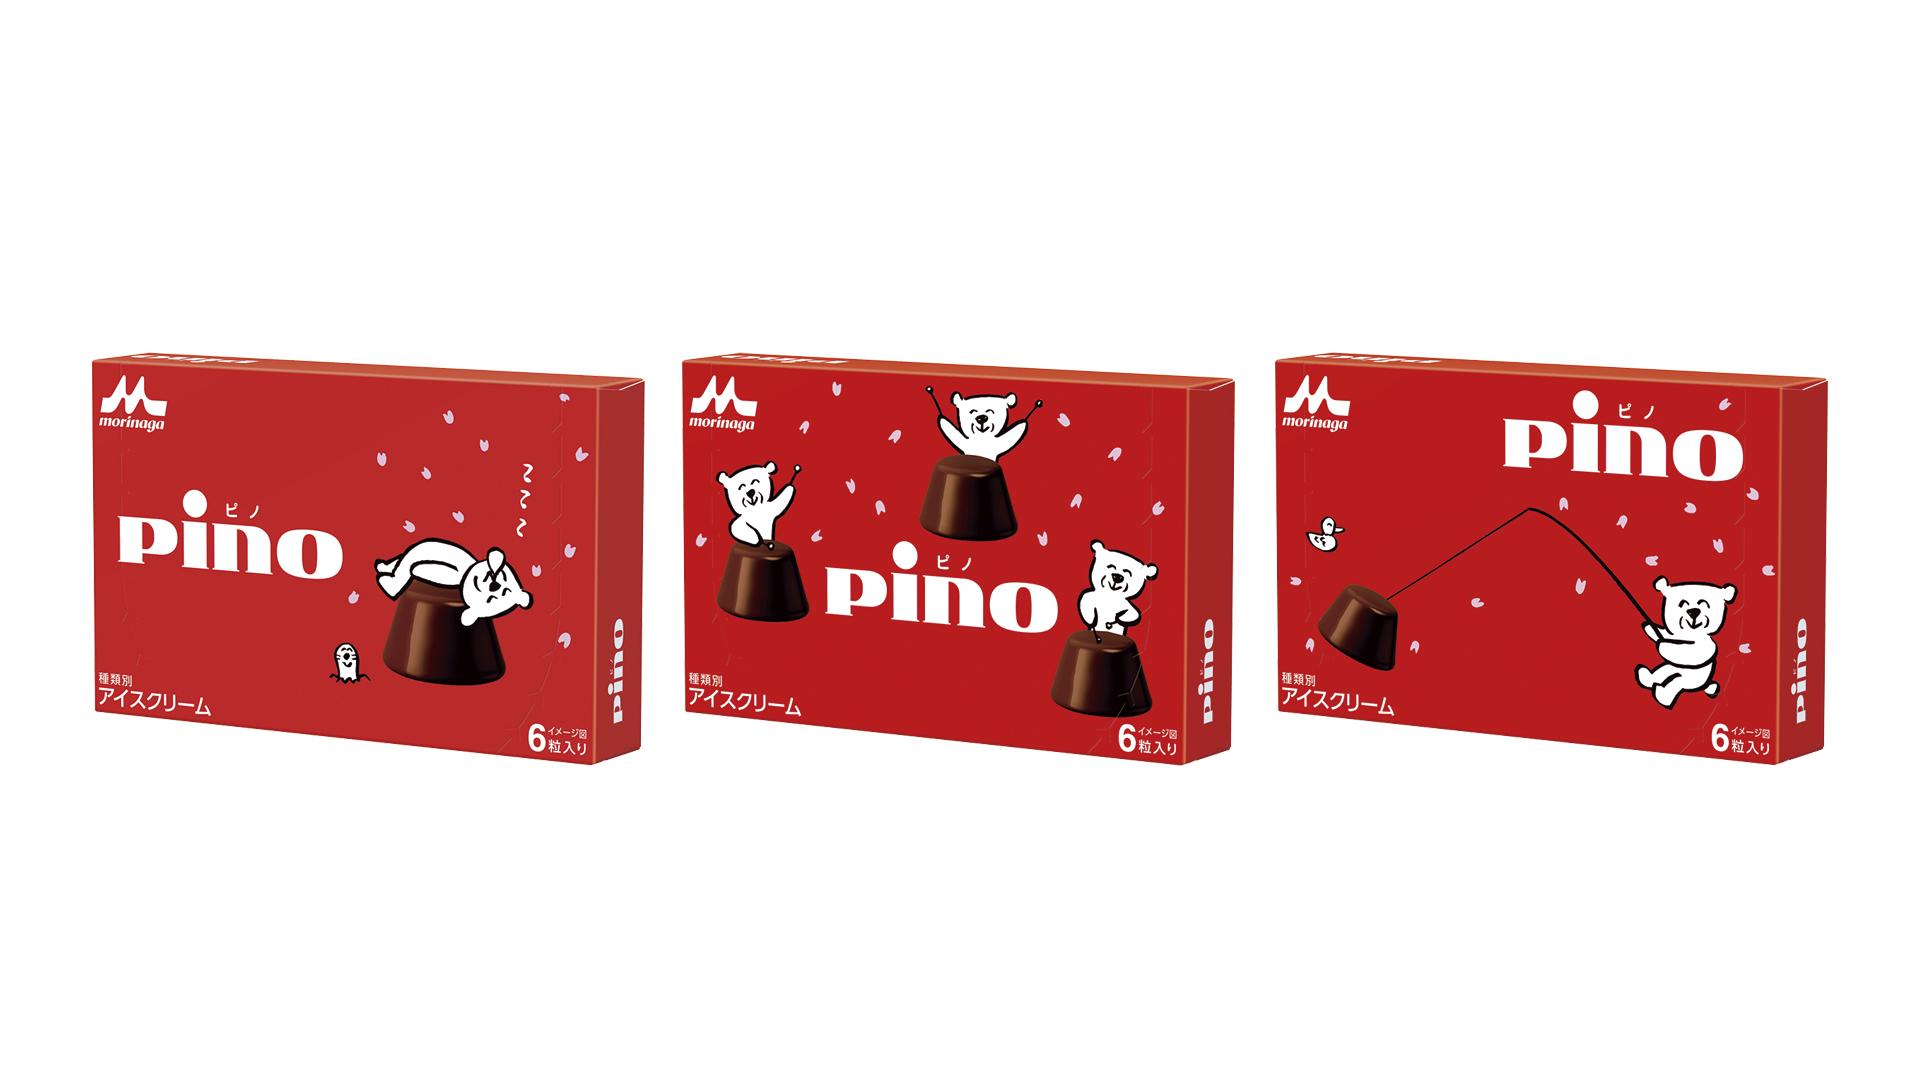 PINO / ピノ(春限定パッケージ)